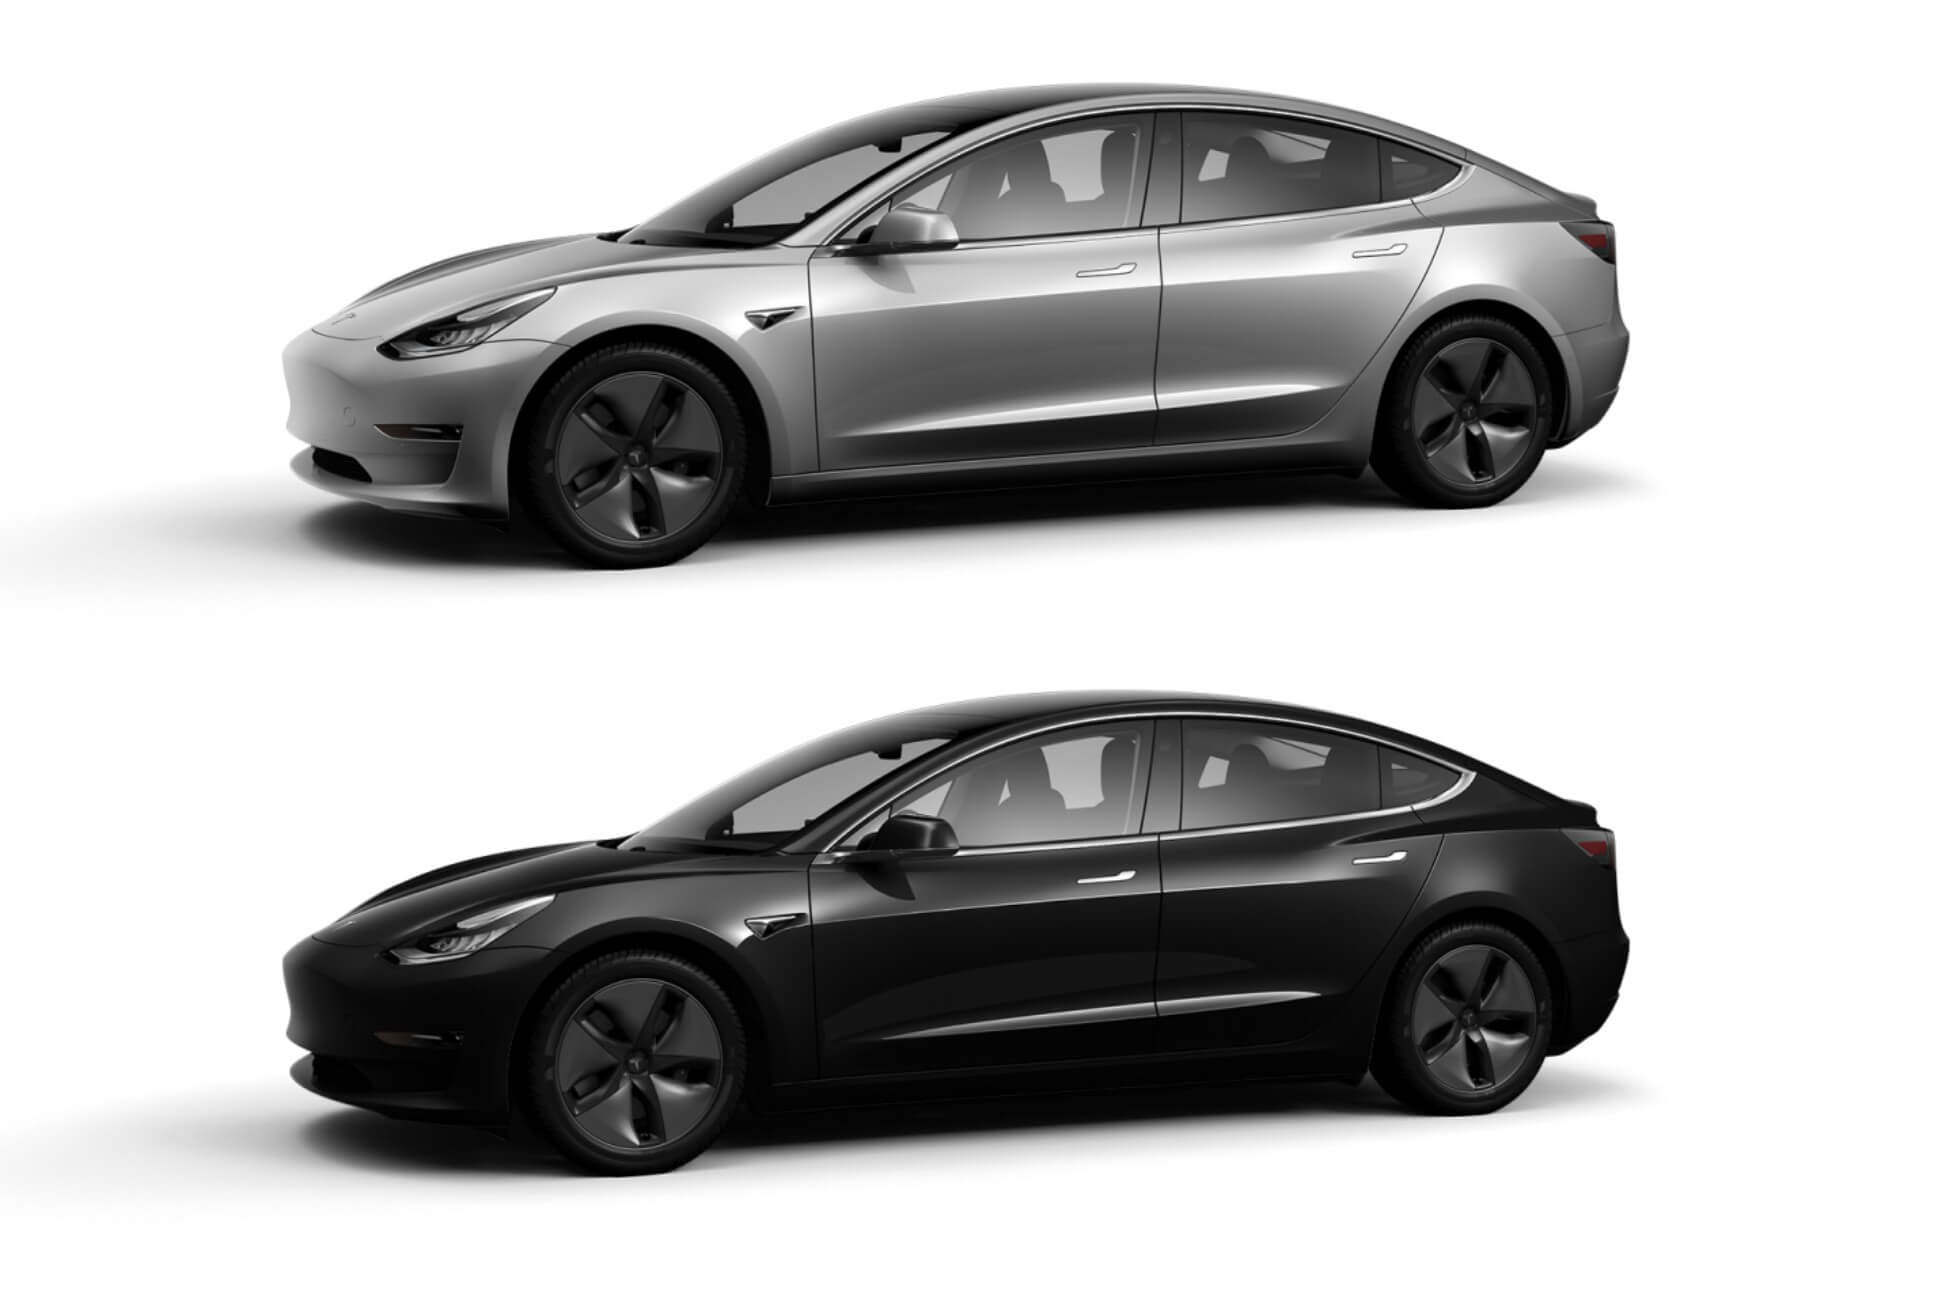 Tesla исключает 2цвета кузова: Silver Metallic иObsidian Black Metallic